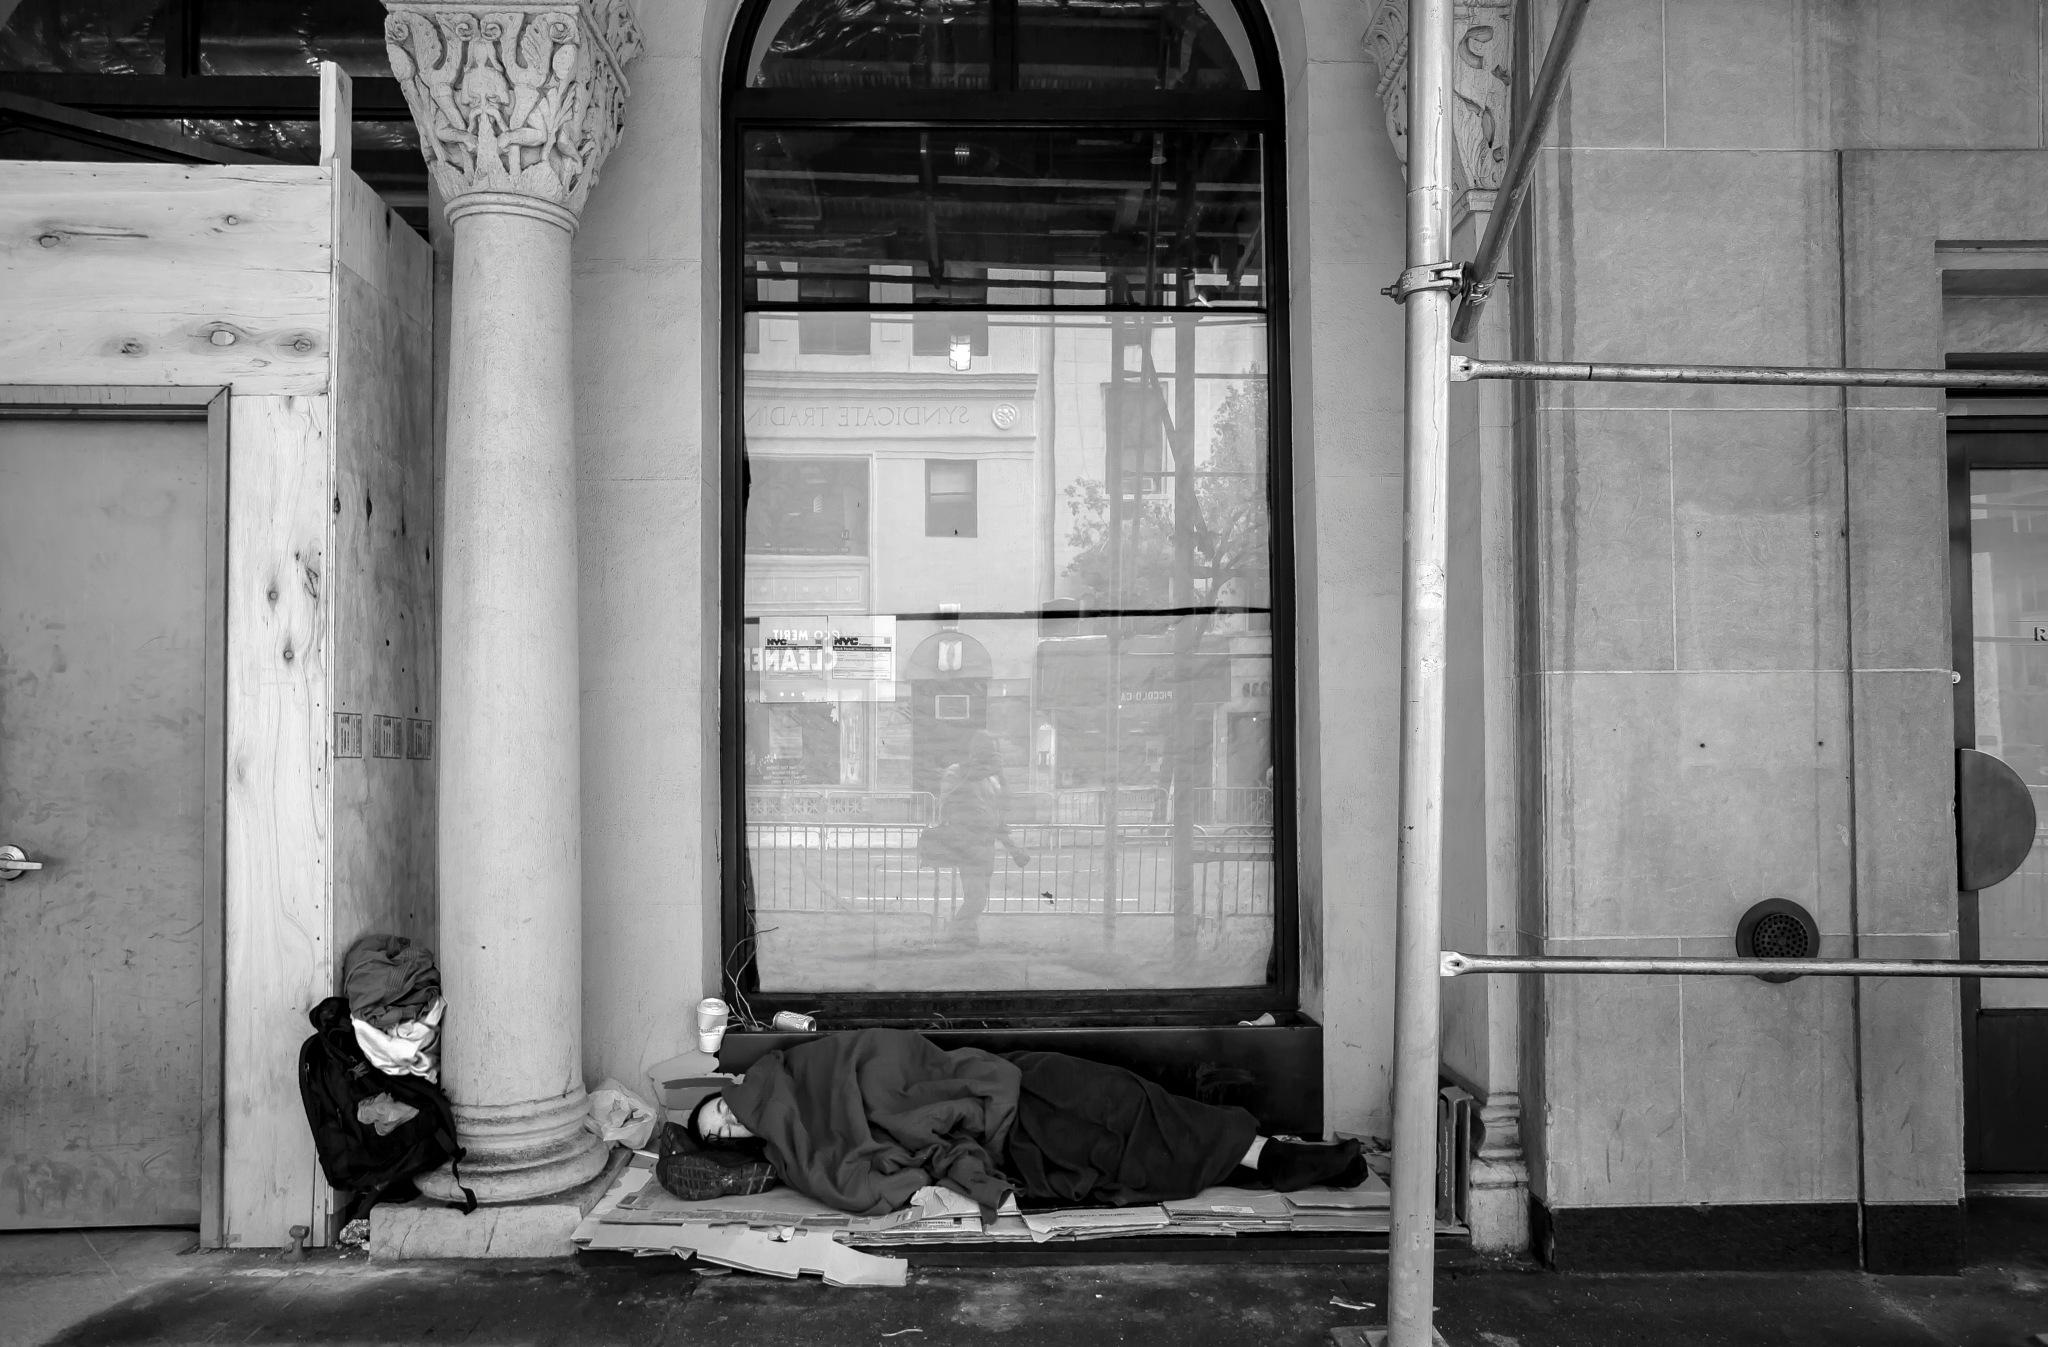 Sleeping Rough by robertullmann